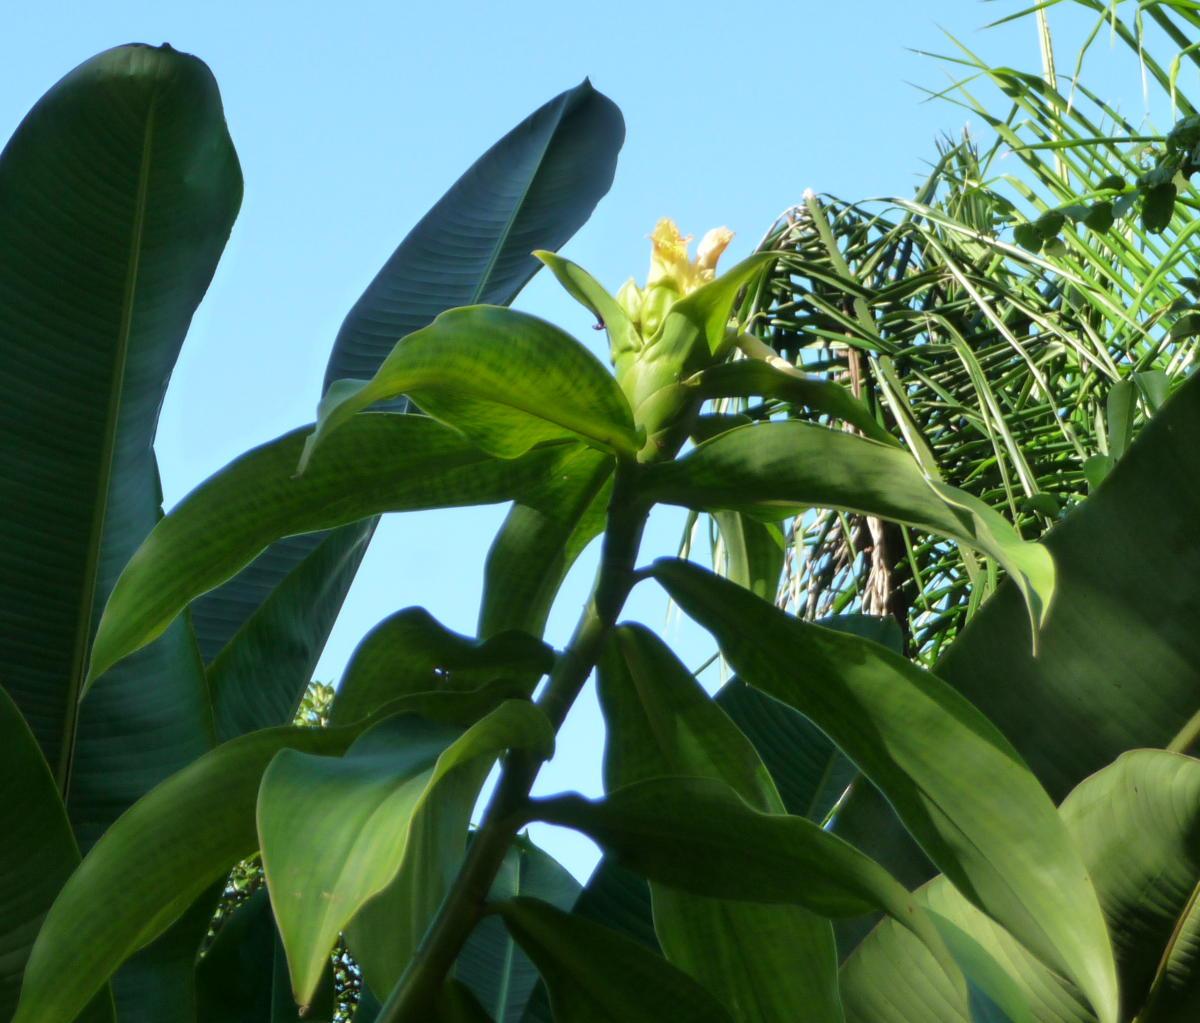 Photo# 16198 - Costus guanaiensis var. guan. - origin unknown